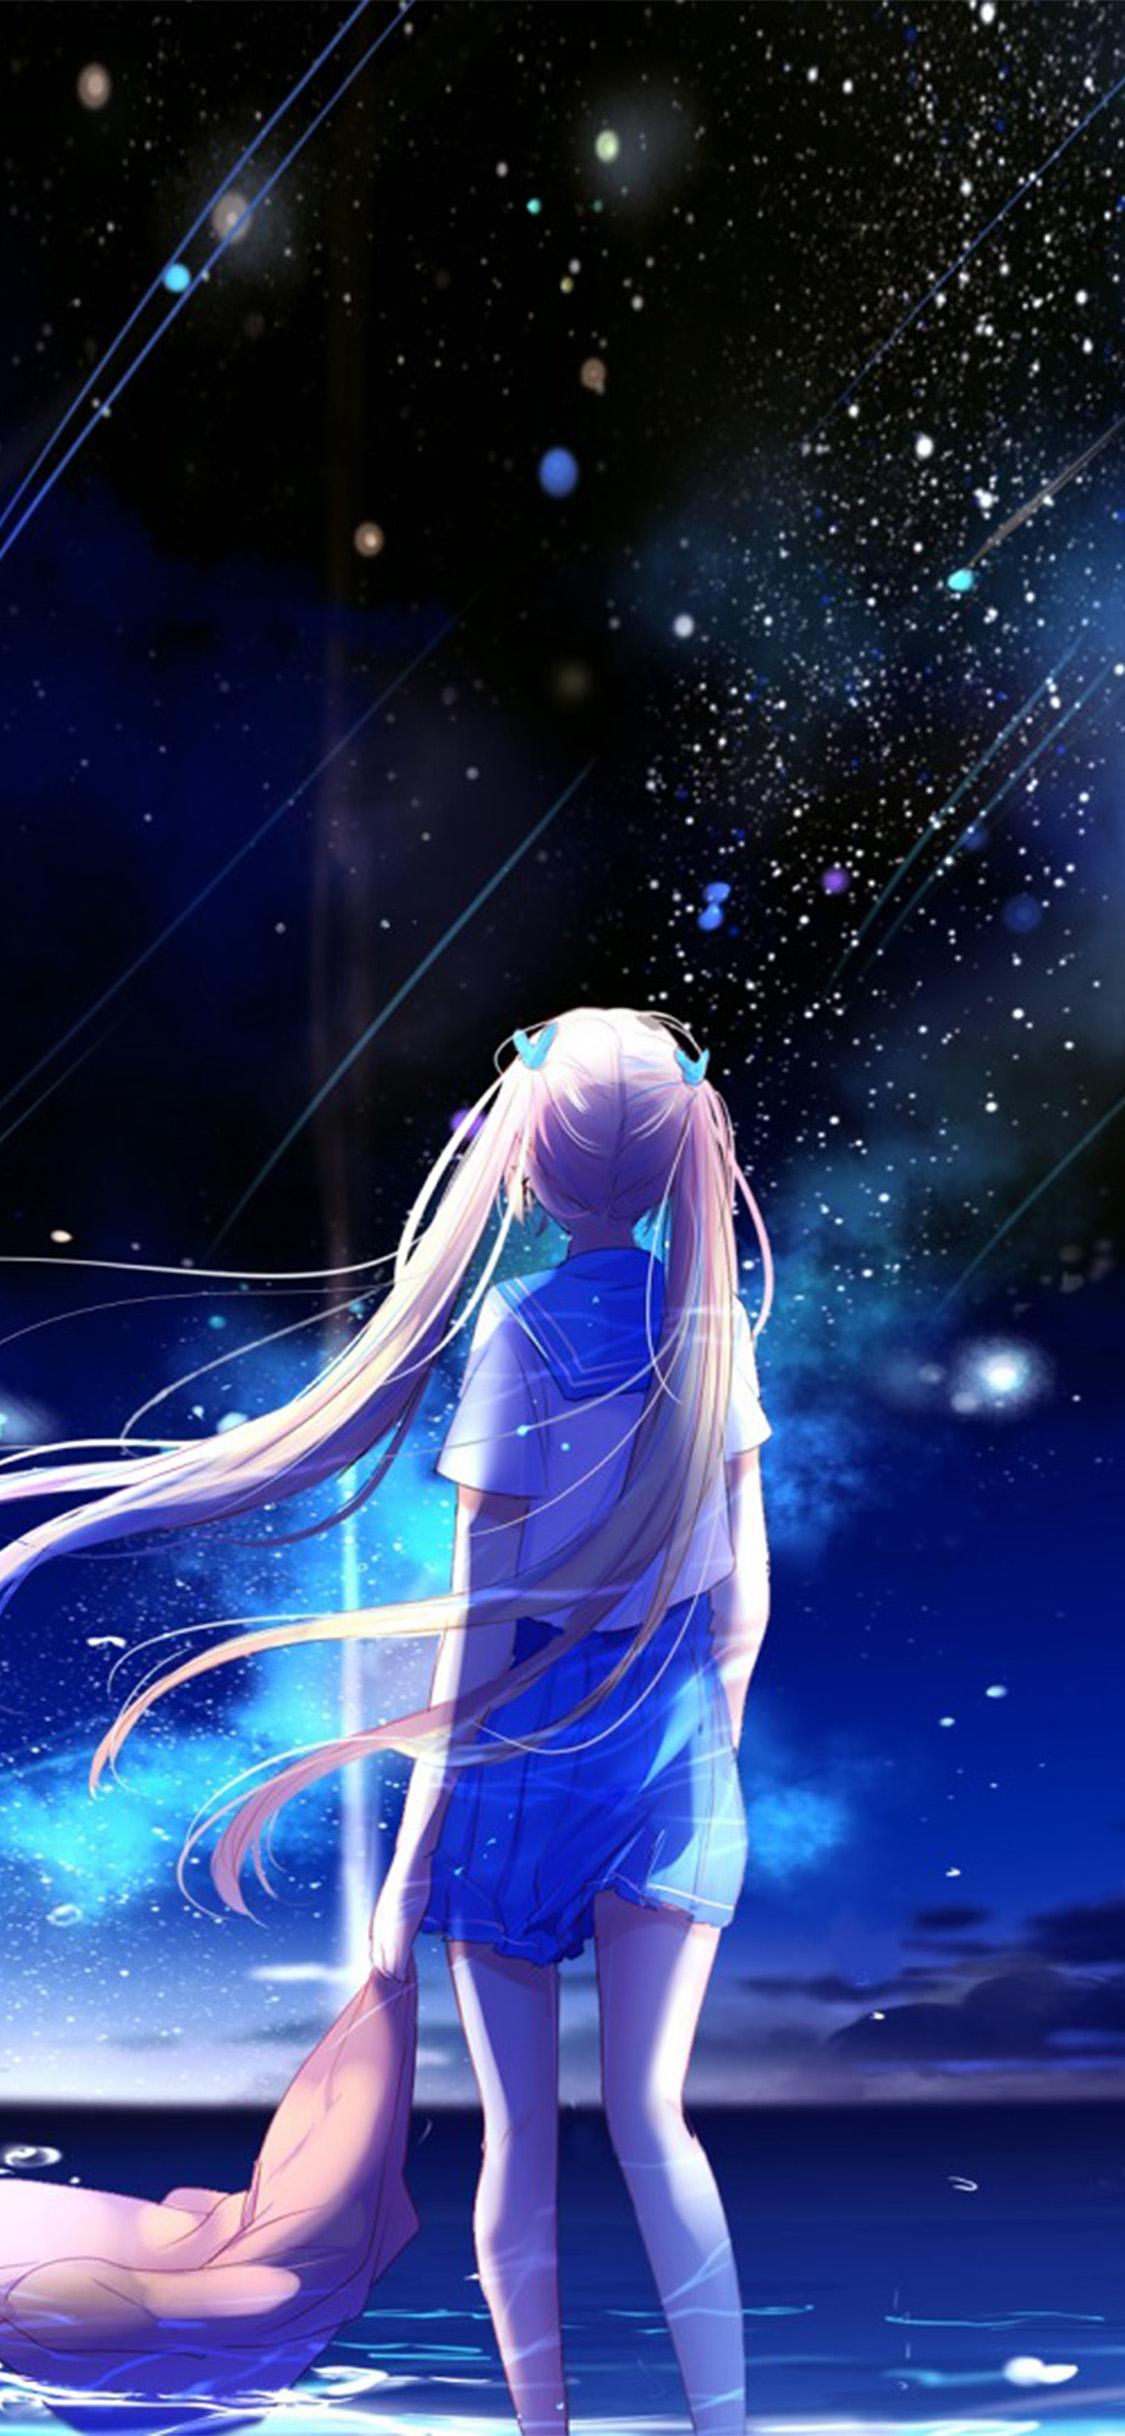 Anime Kawaii Girl Wallpaper Bc64 Anime Night Space Star Art Illustration Wallpaper